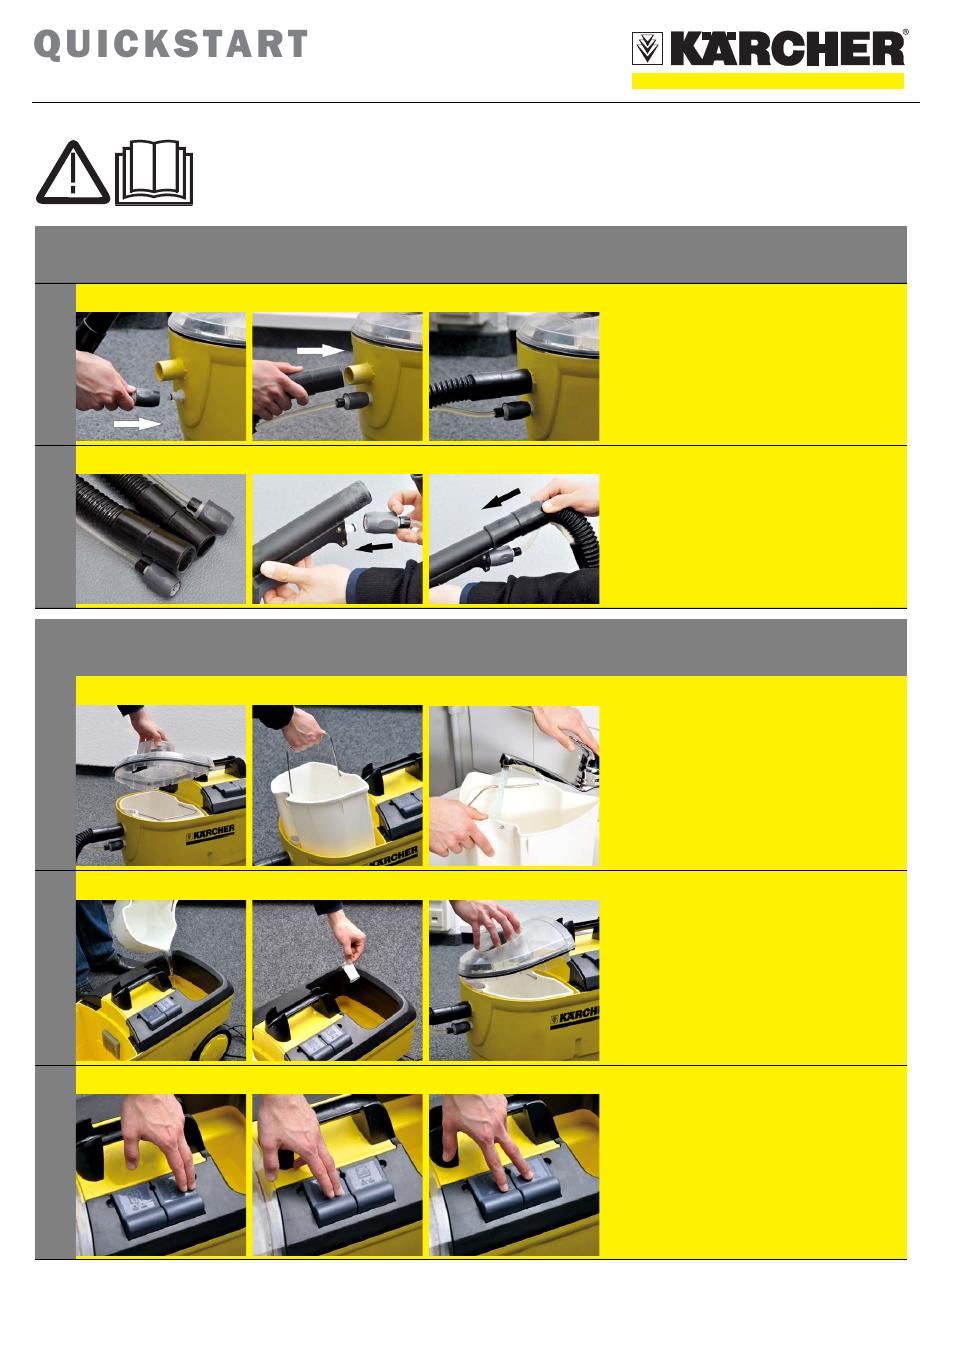 karcher window cleaner instruction manual